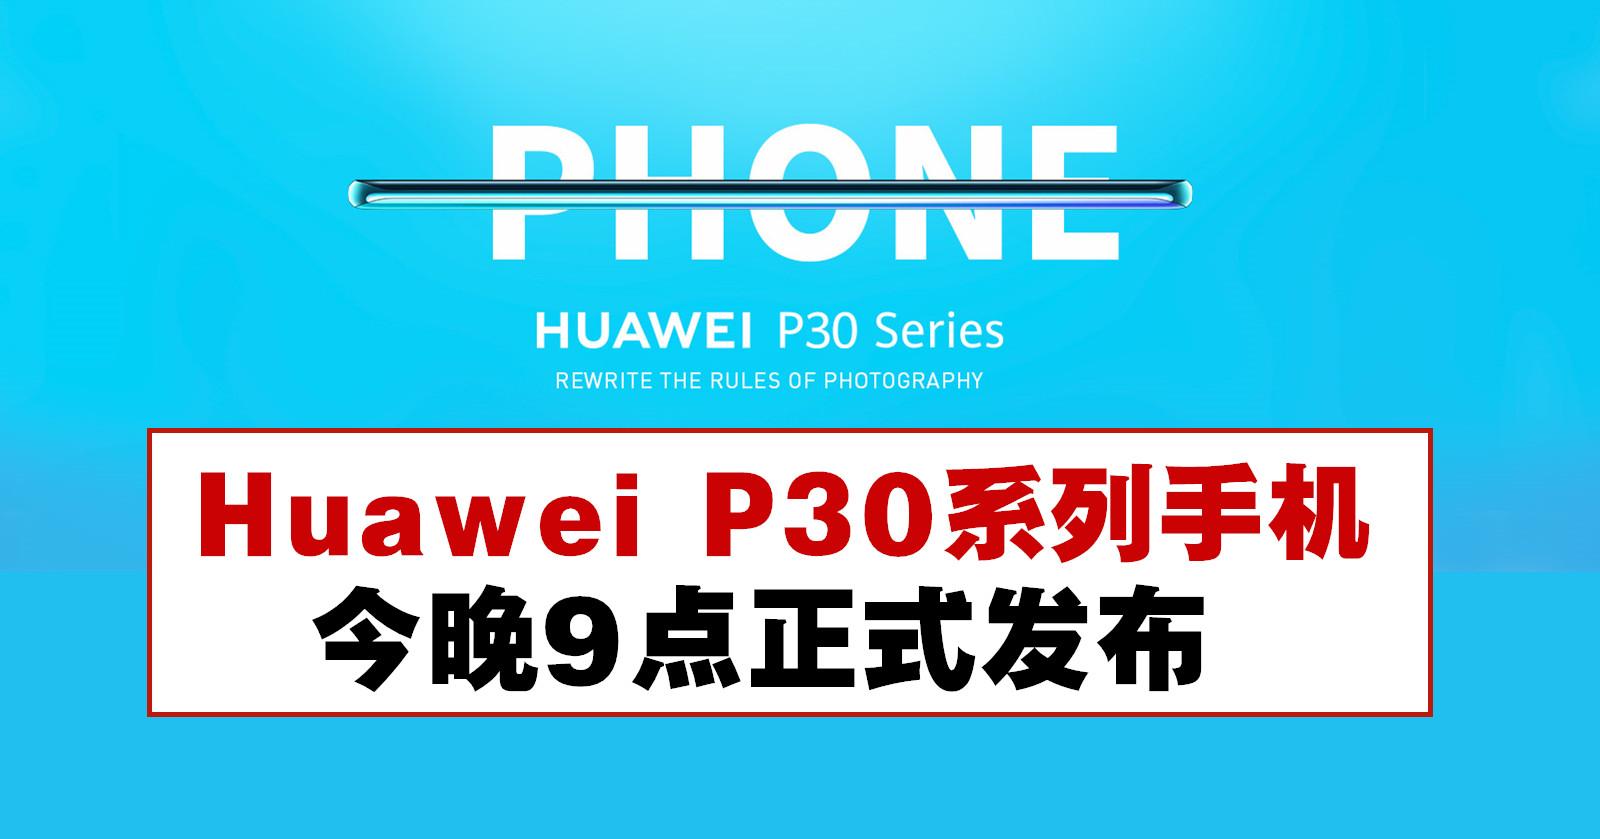 Huawei P30系列手机,今晚9点正式发布